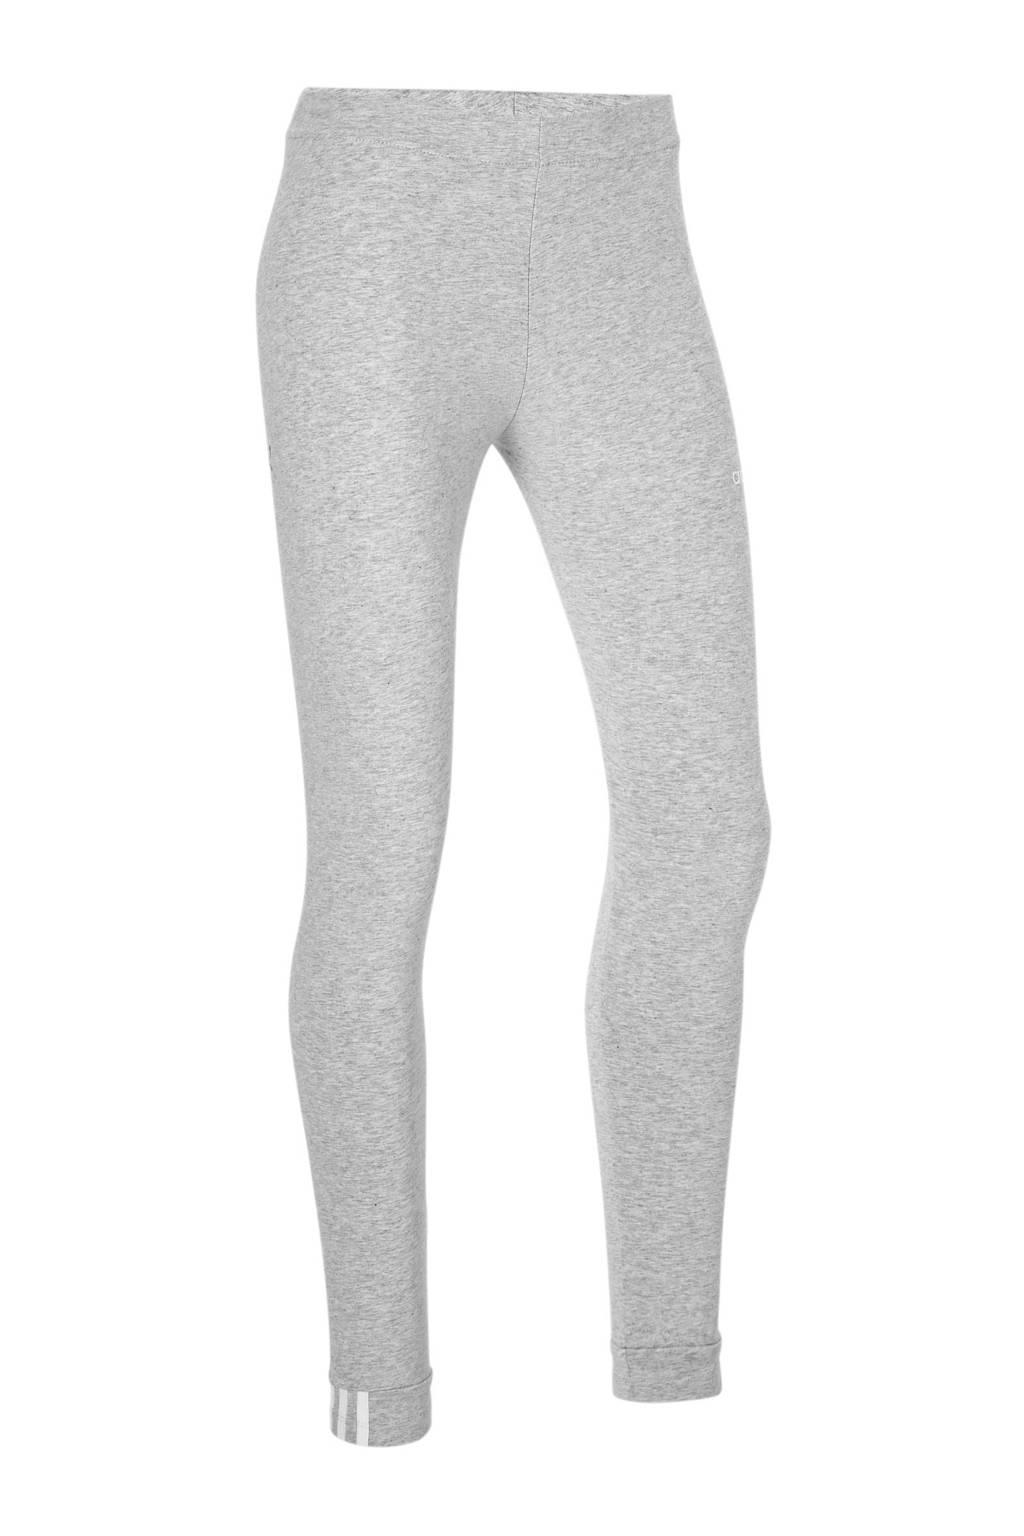 adidas originals legging grijs, Grijs/wit